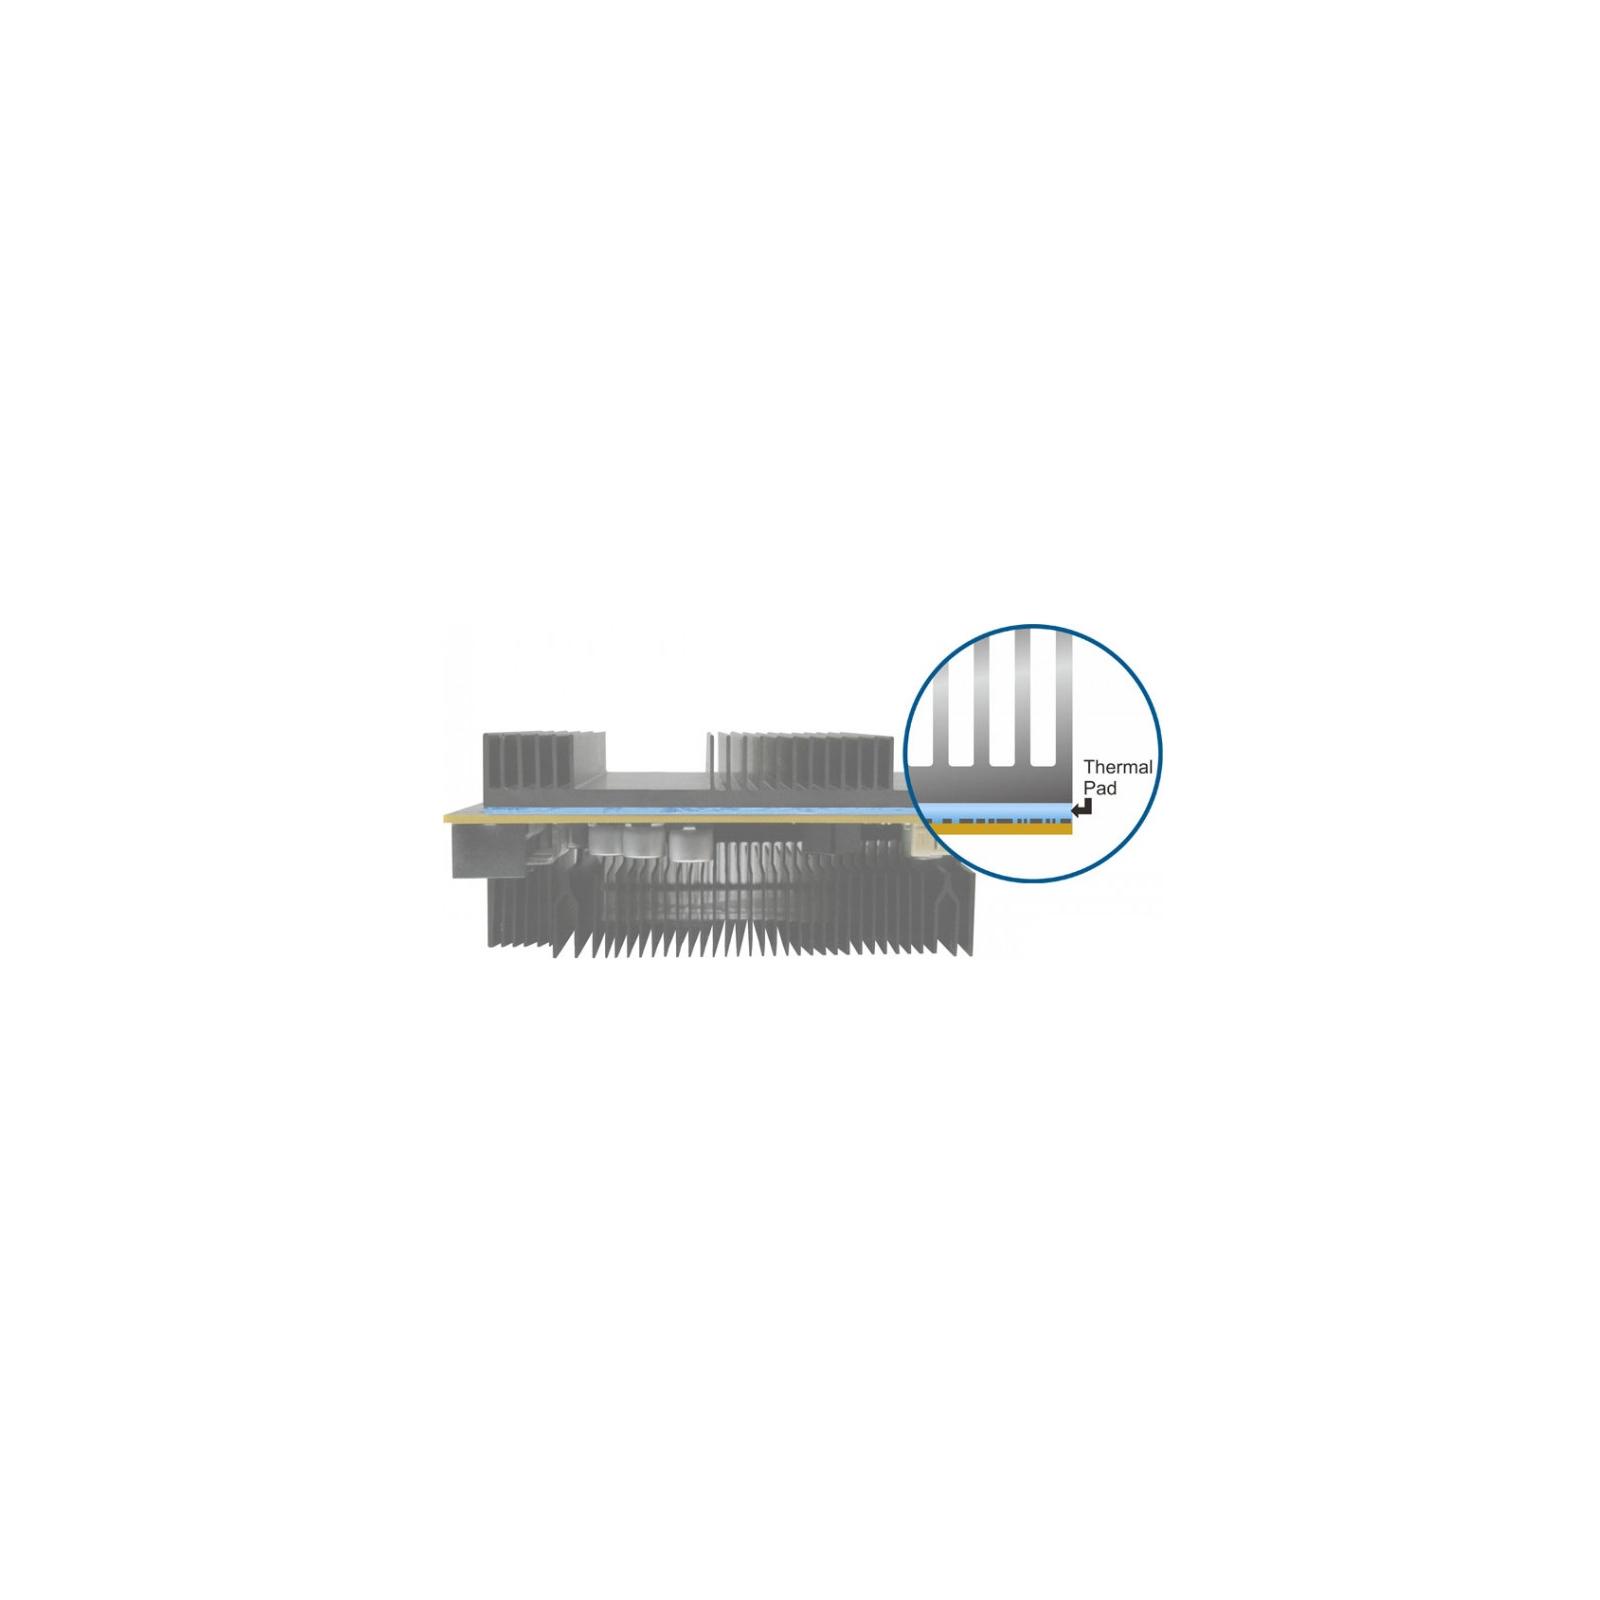 Термопрокладка Arctic Thermal pad 145x145mm t 1.5mm (ACTPD00006A) изображение 5